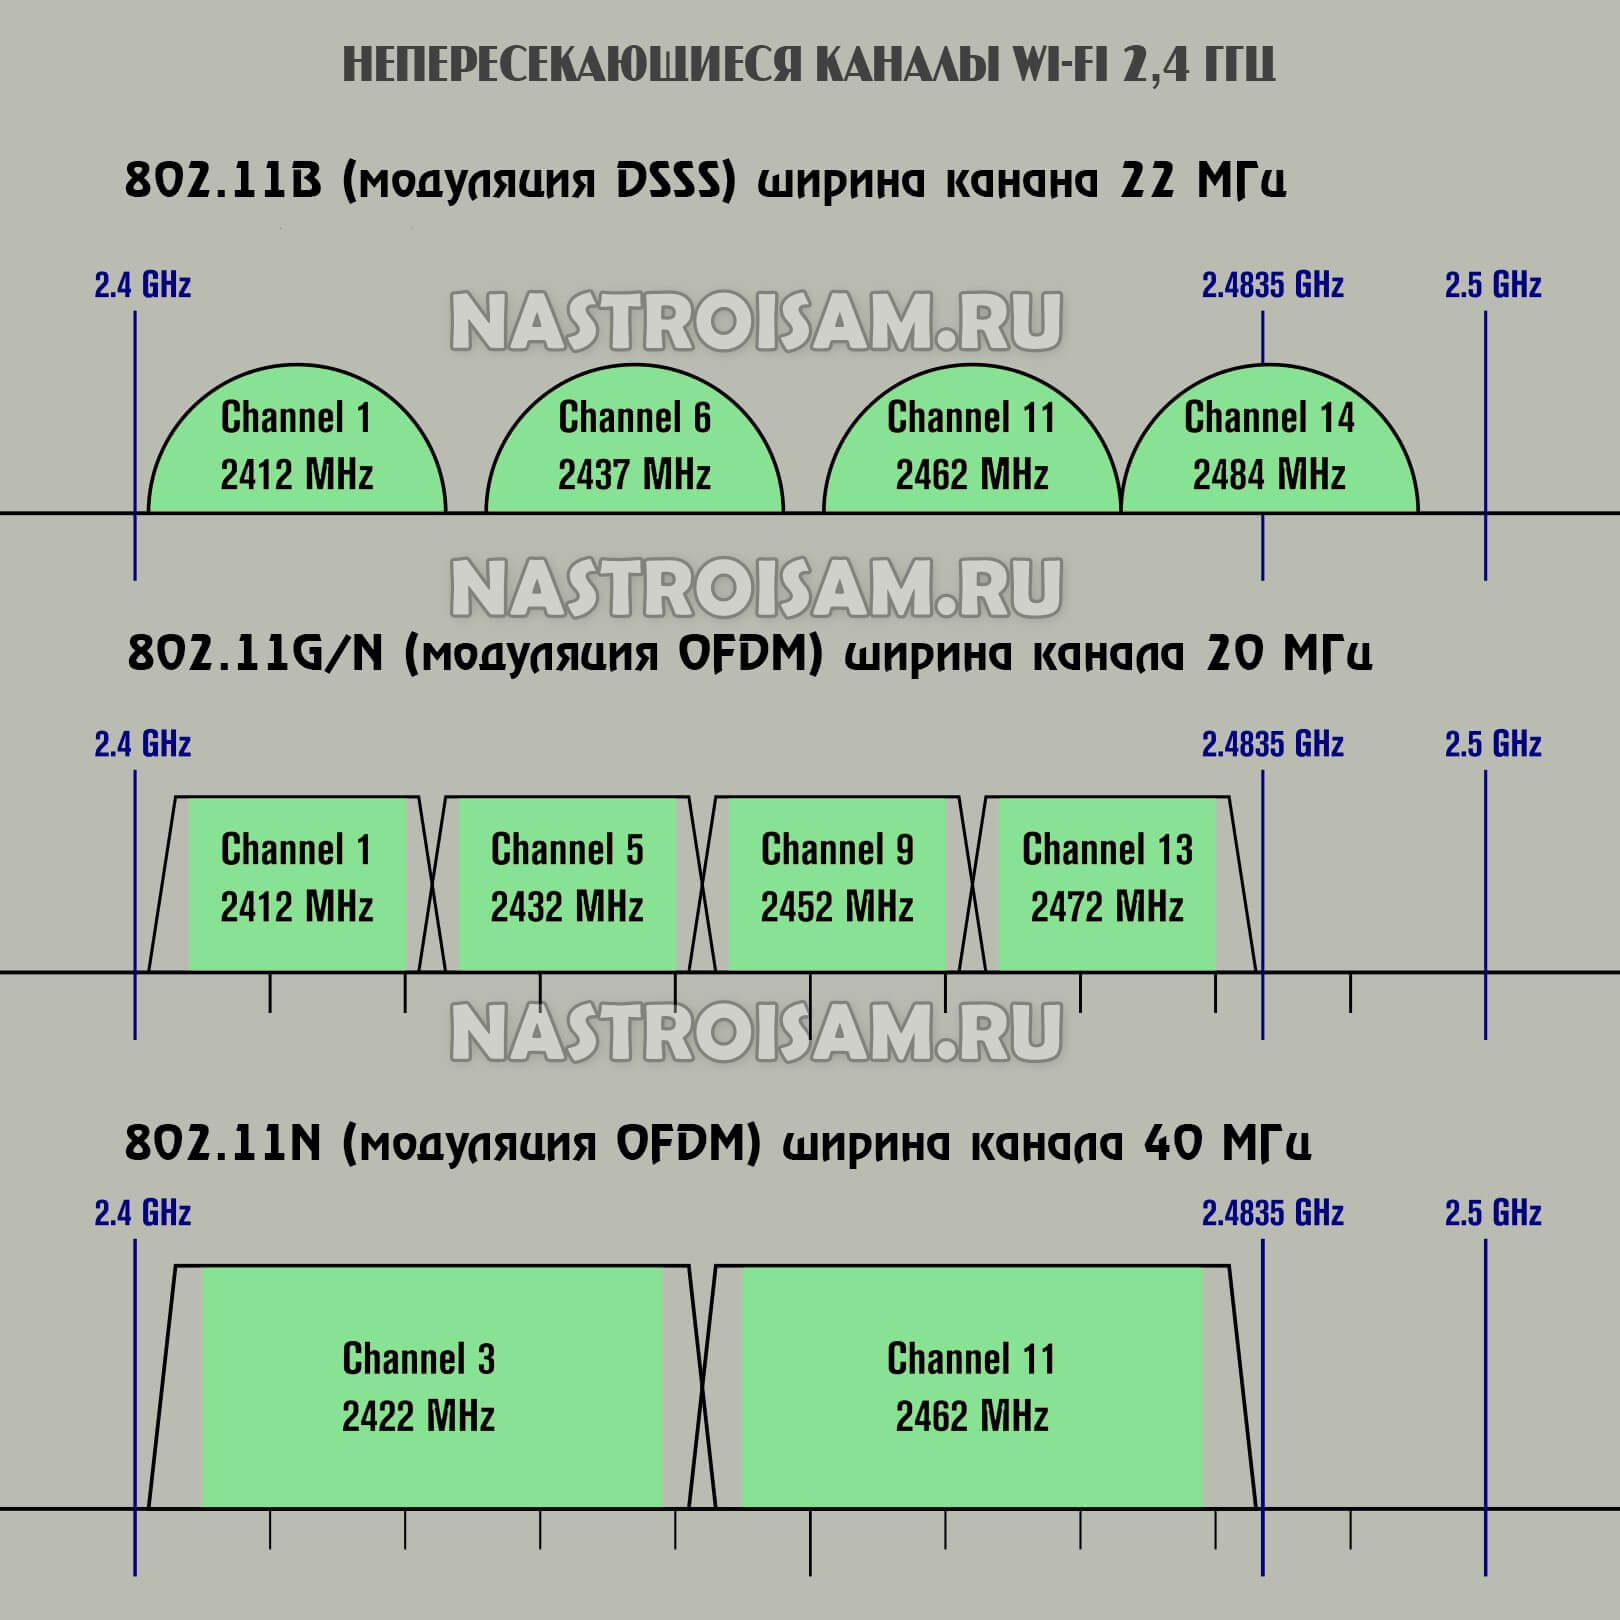 какую выбрать ширину канала wifi